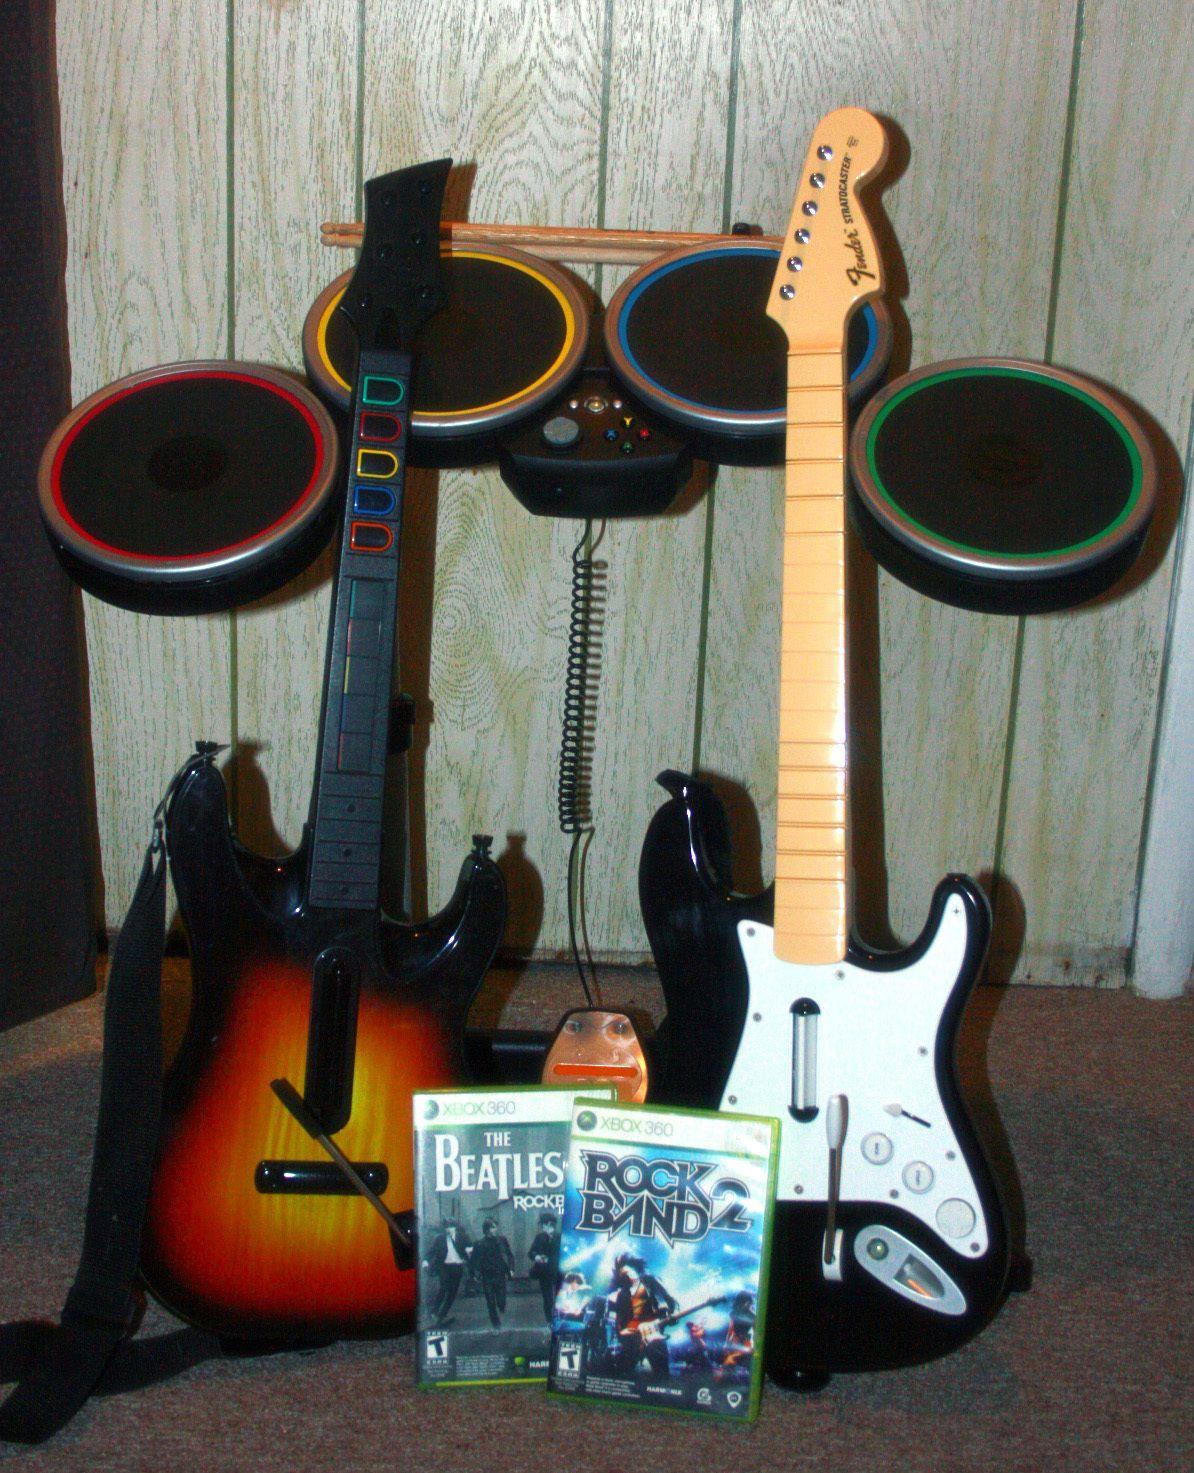 Xbox 360 Rockband 2 bundle: Wireless drums, 2 Guitars, Rock